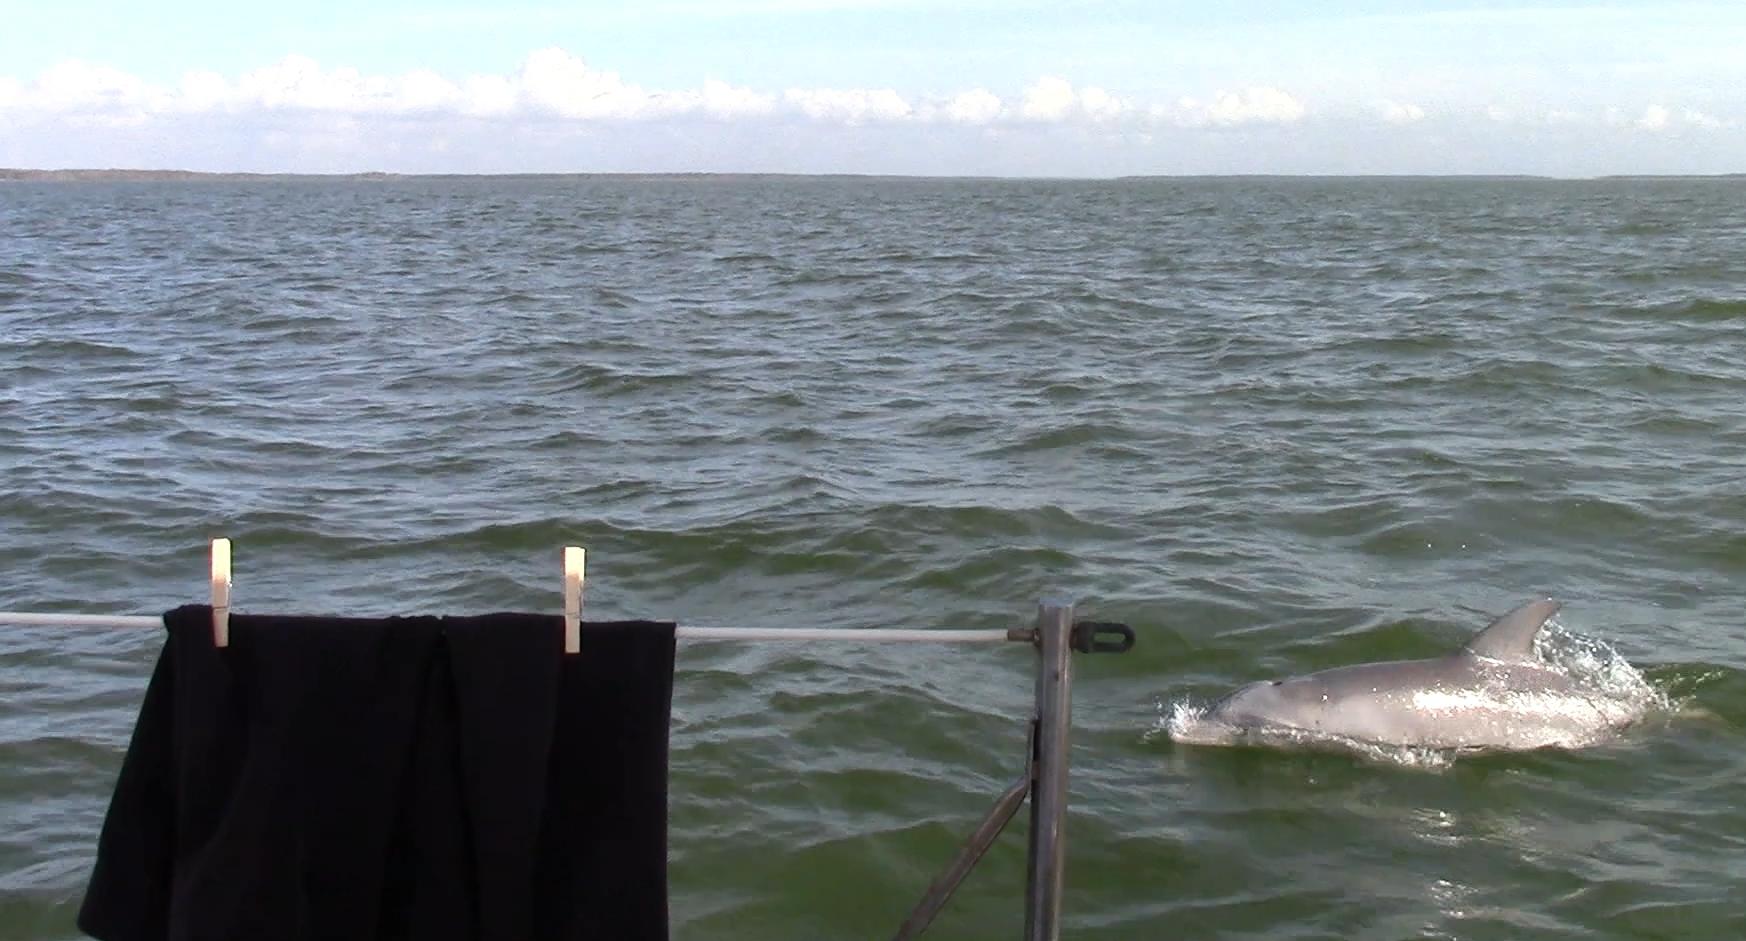 Always love seeing dolphins.